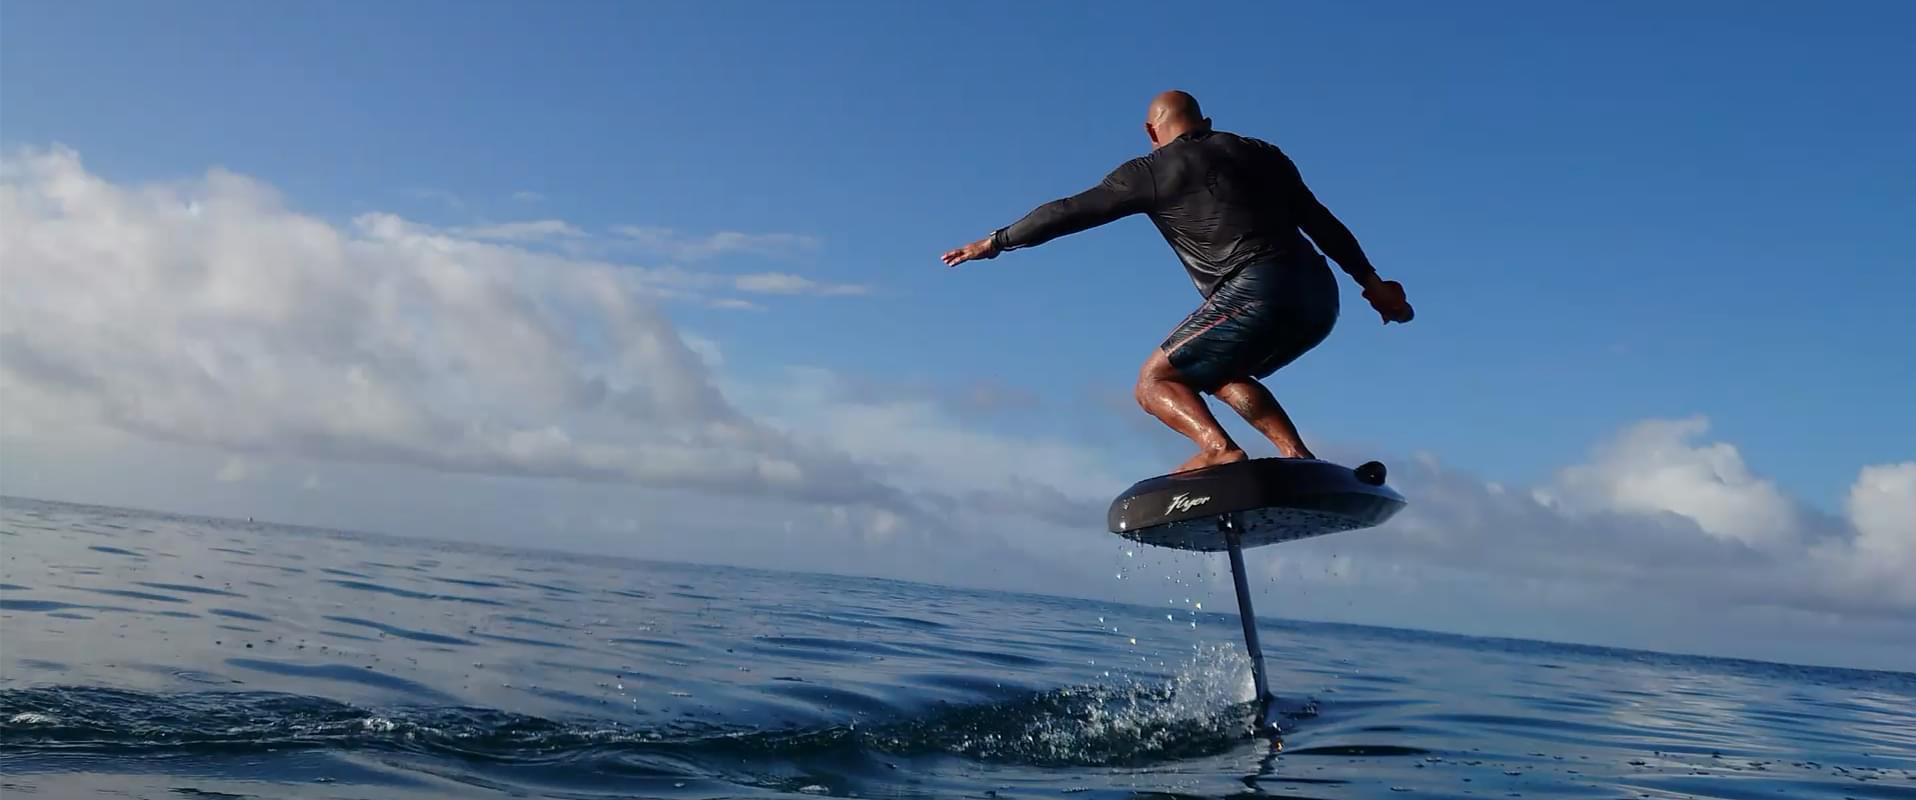 【CES2020】WaydooFlyer电动水翼冲浪板发布,滑浪无需乘风